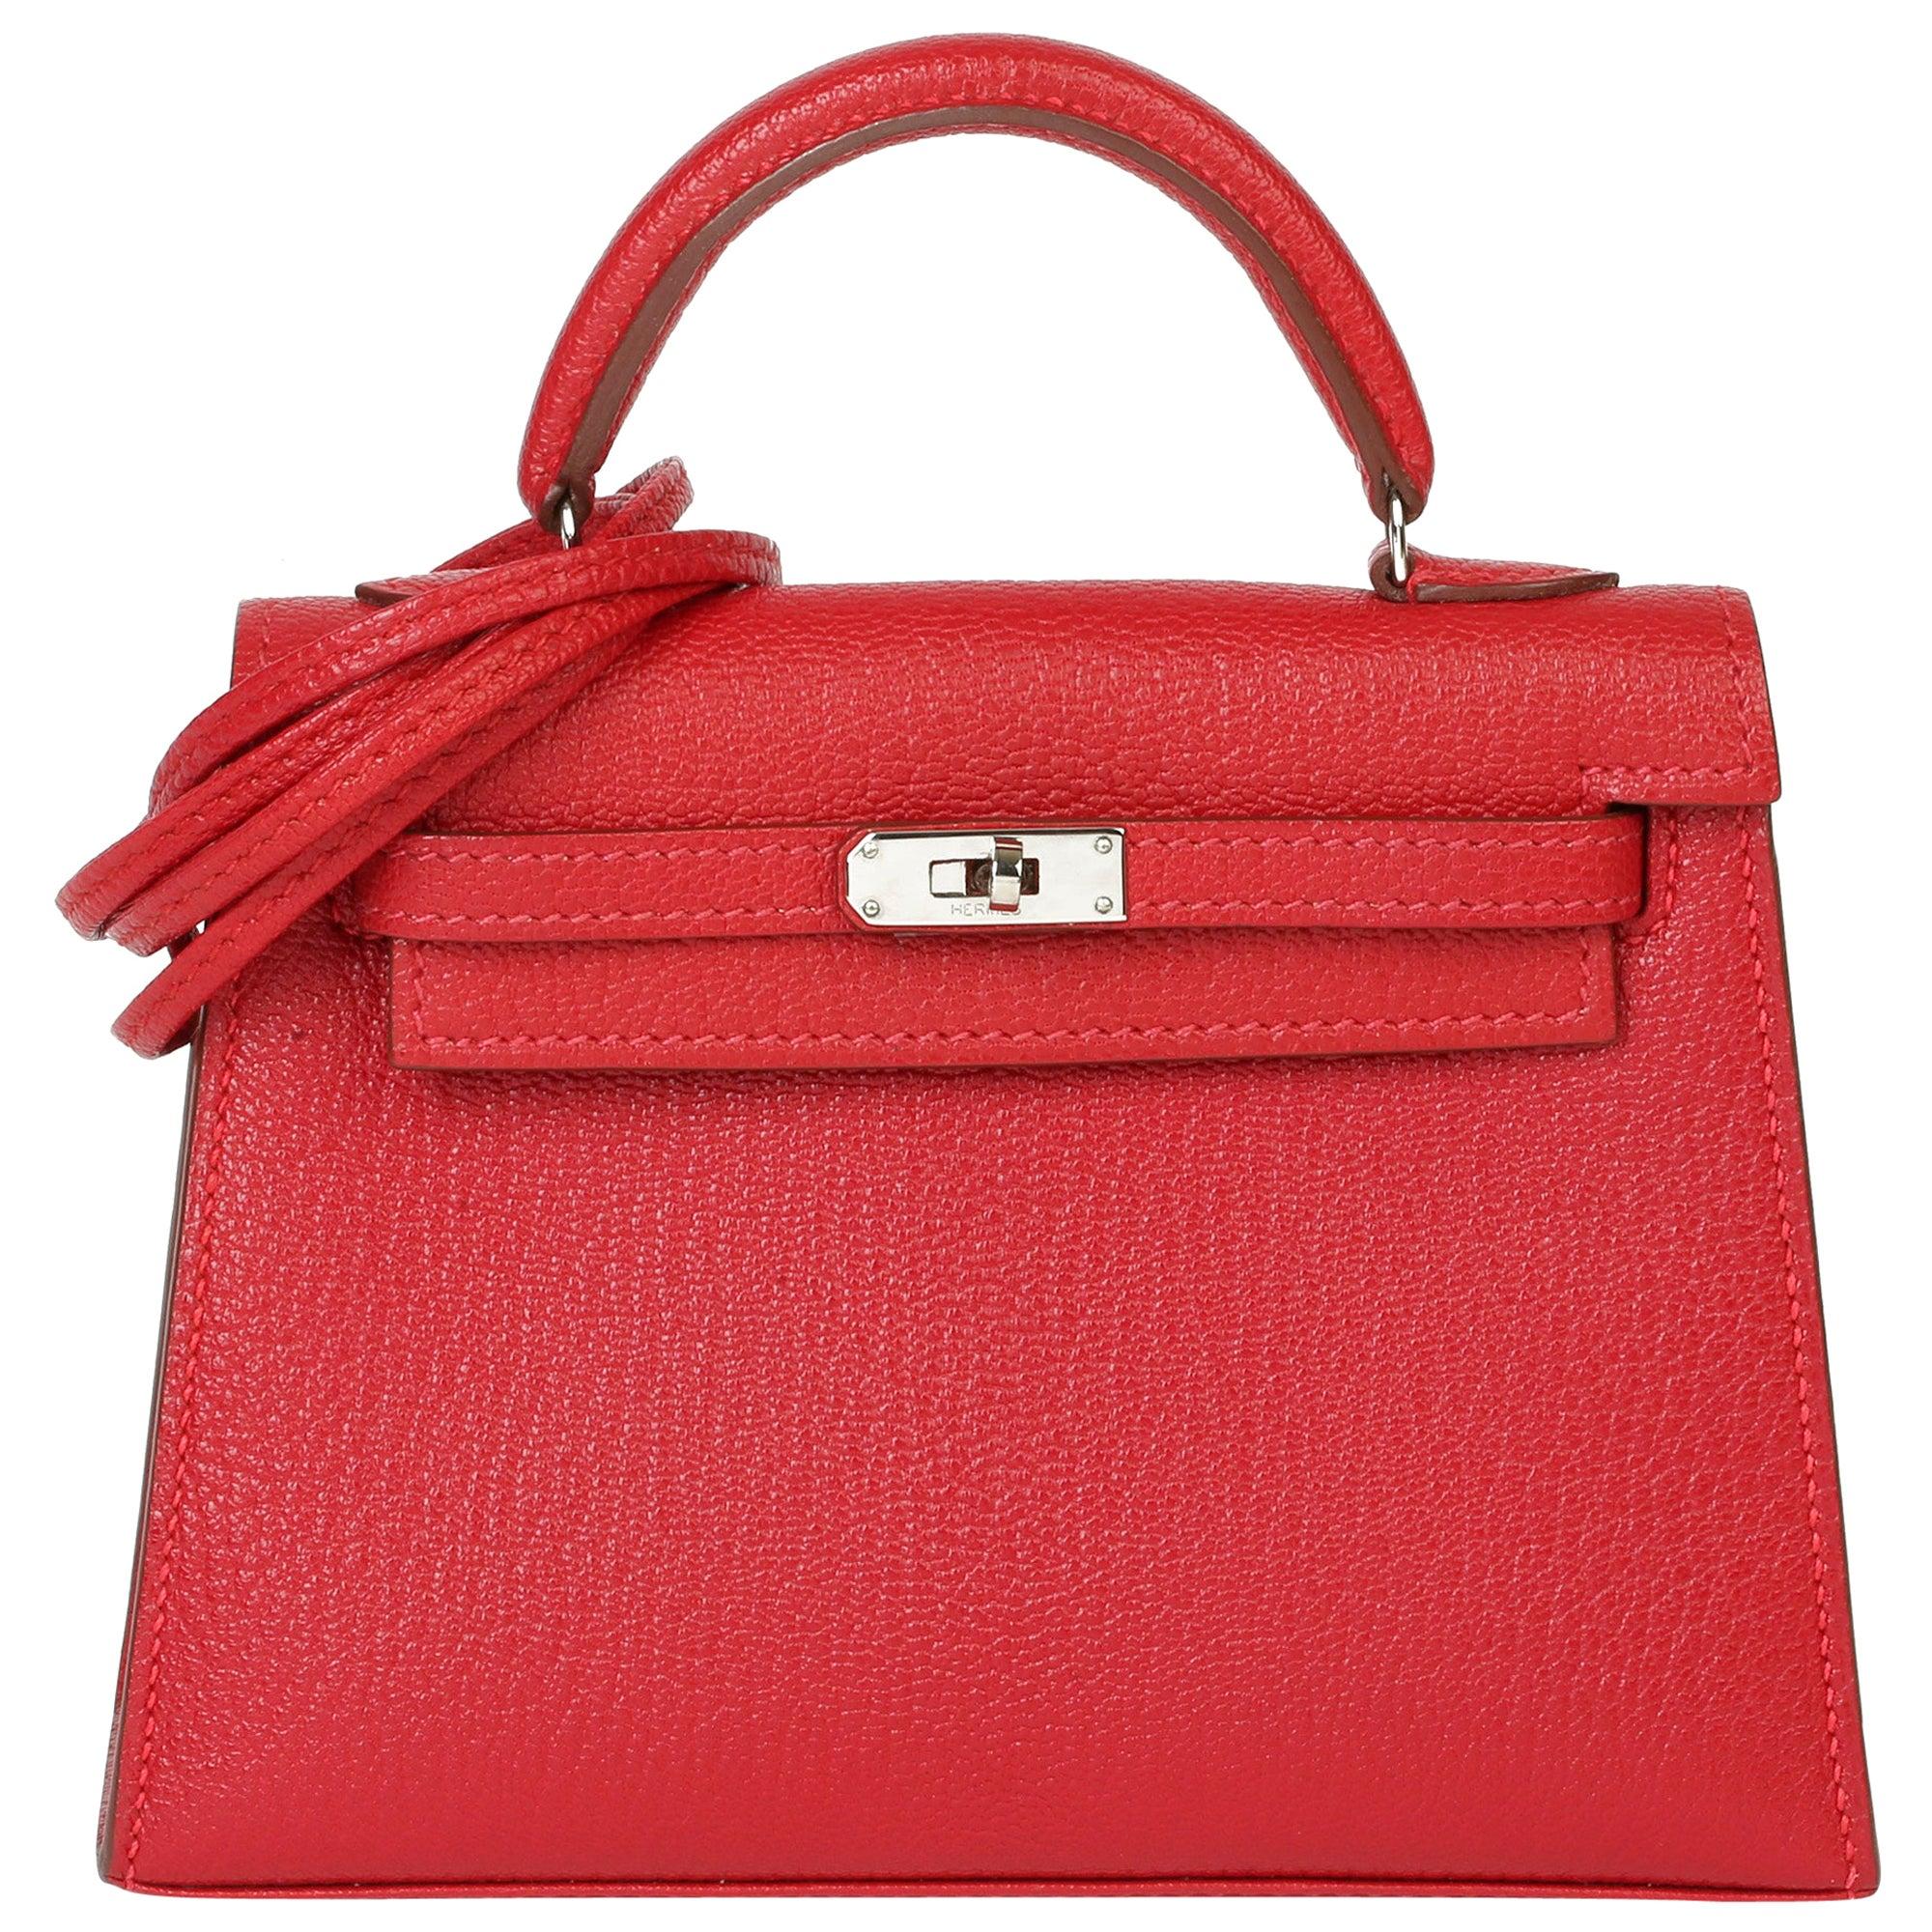 Hermès Rouge Casaque Chevre Mysore Leather Special Order HSS Kelly 15cm Sellier